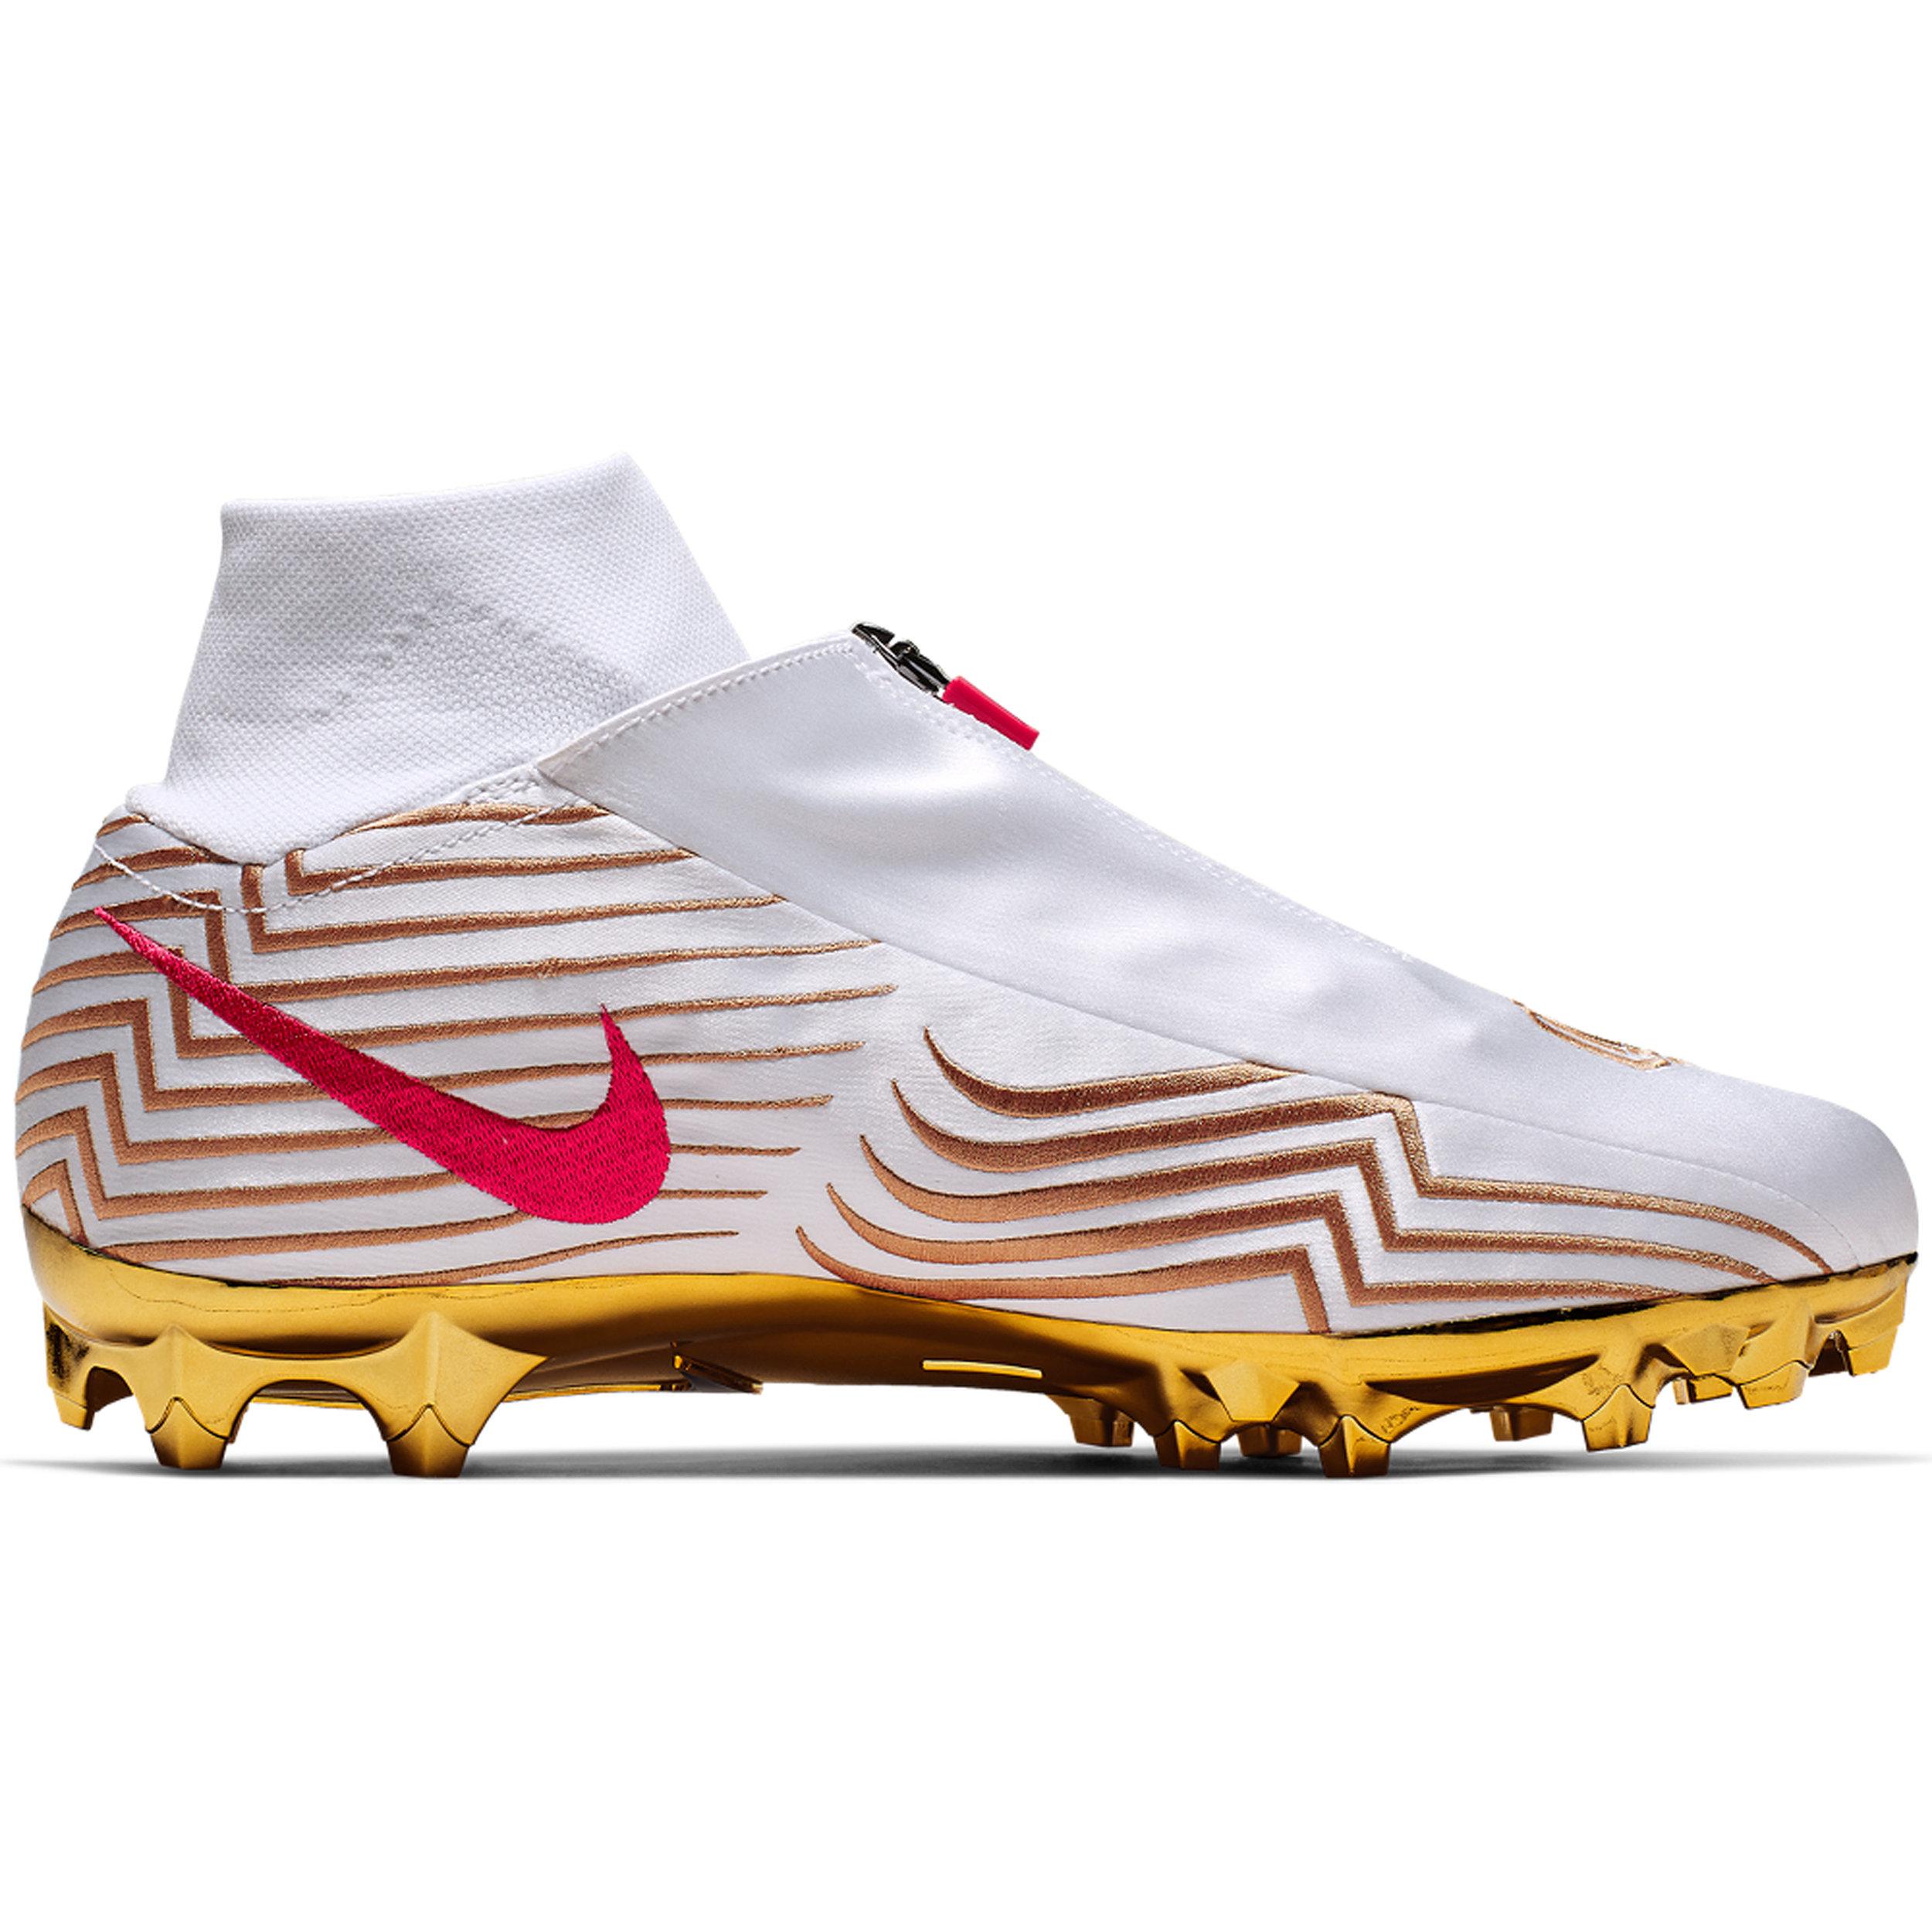 NikeNews_NikeVaporUntouchablePro3_OBJ_07_89288.jpg